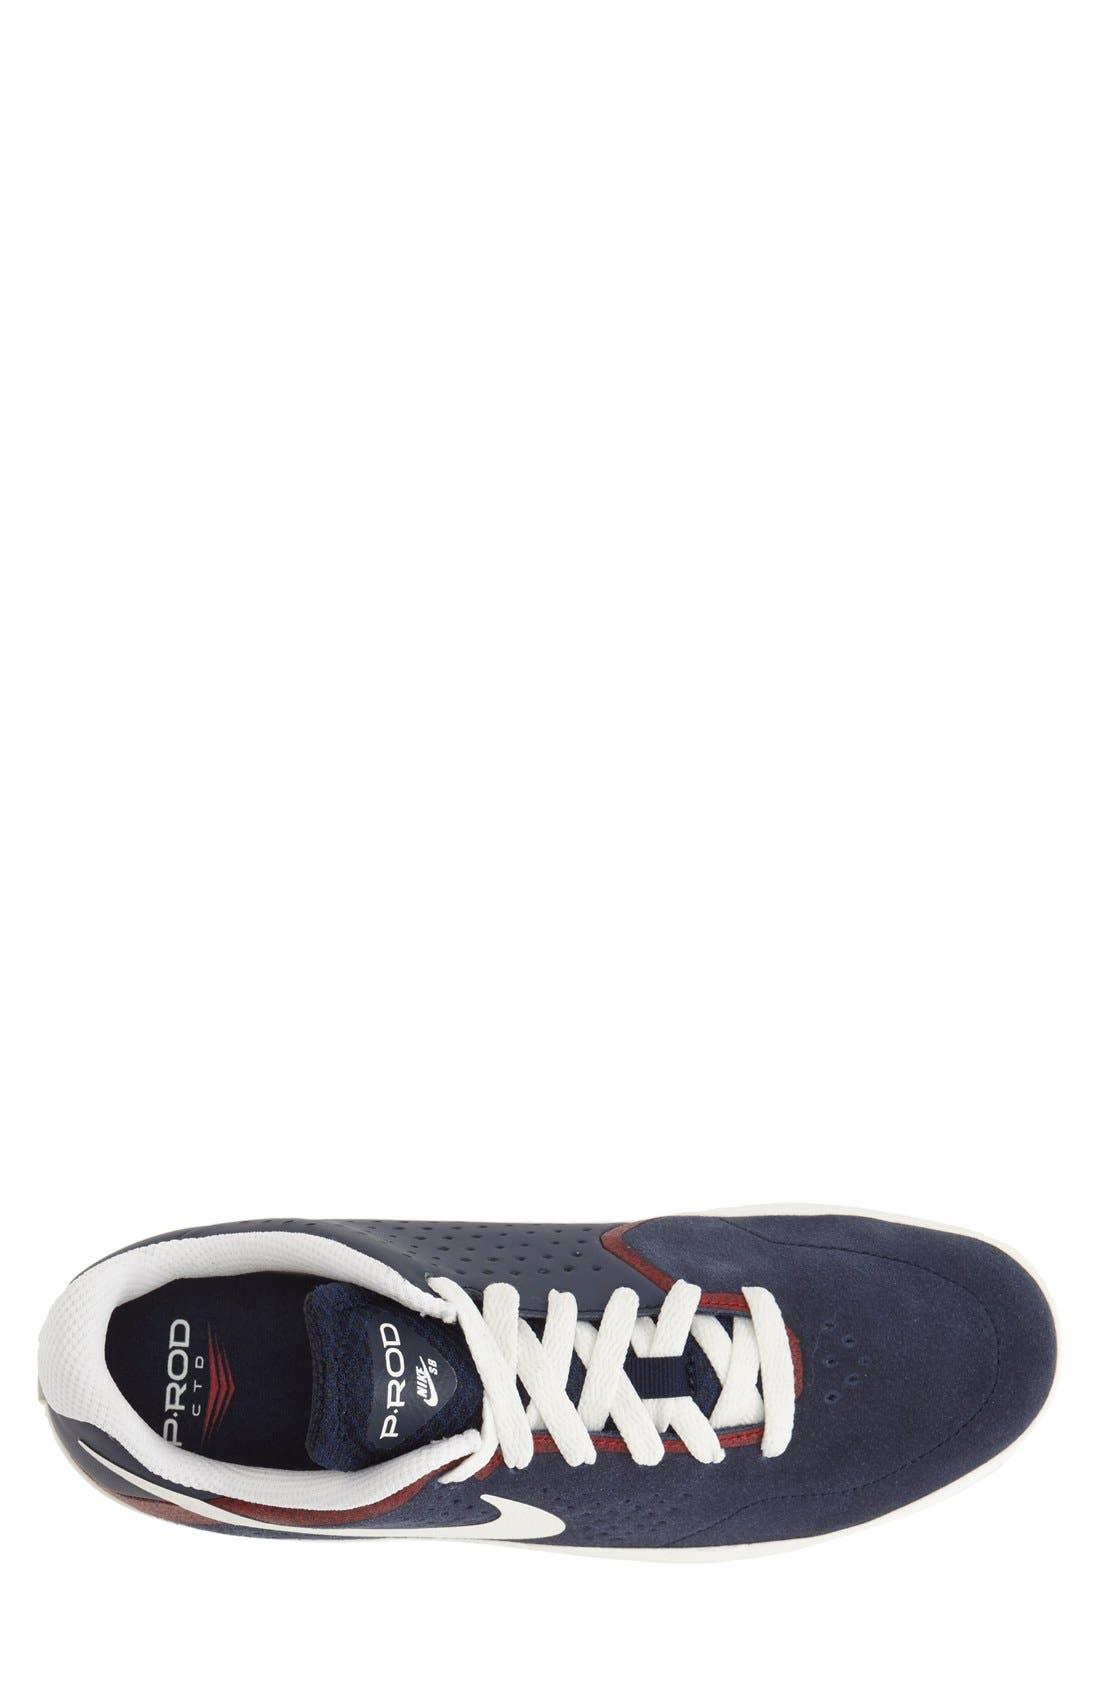 Alternate Image 3  - Nike 'Paul Rodriguez CTD LR SB' Skate Shoe (Men)